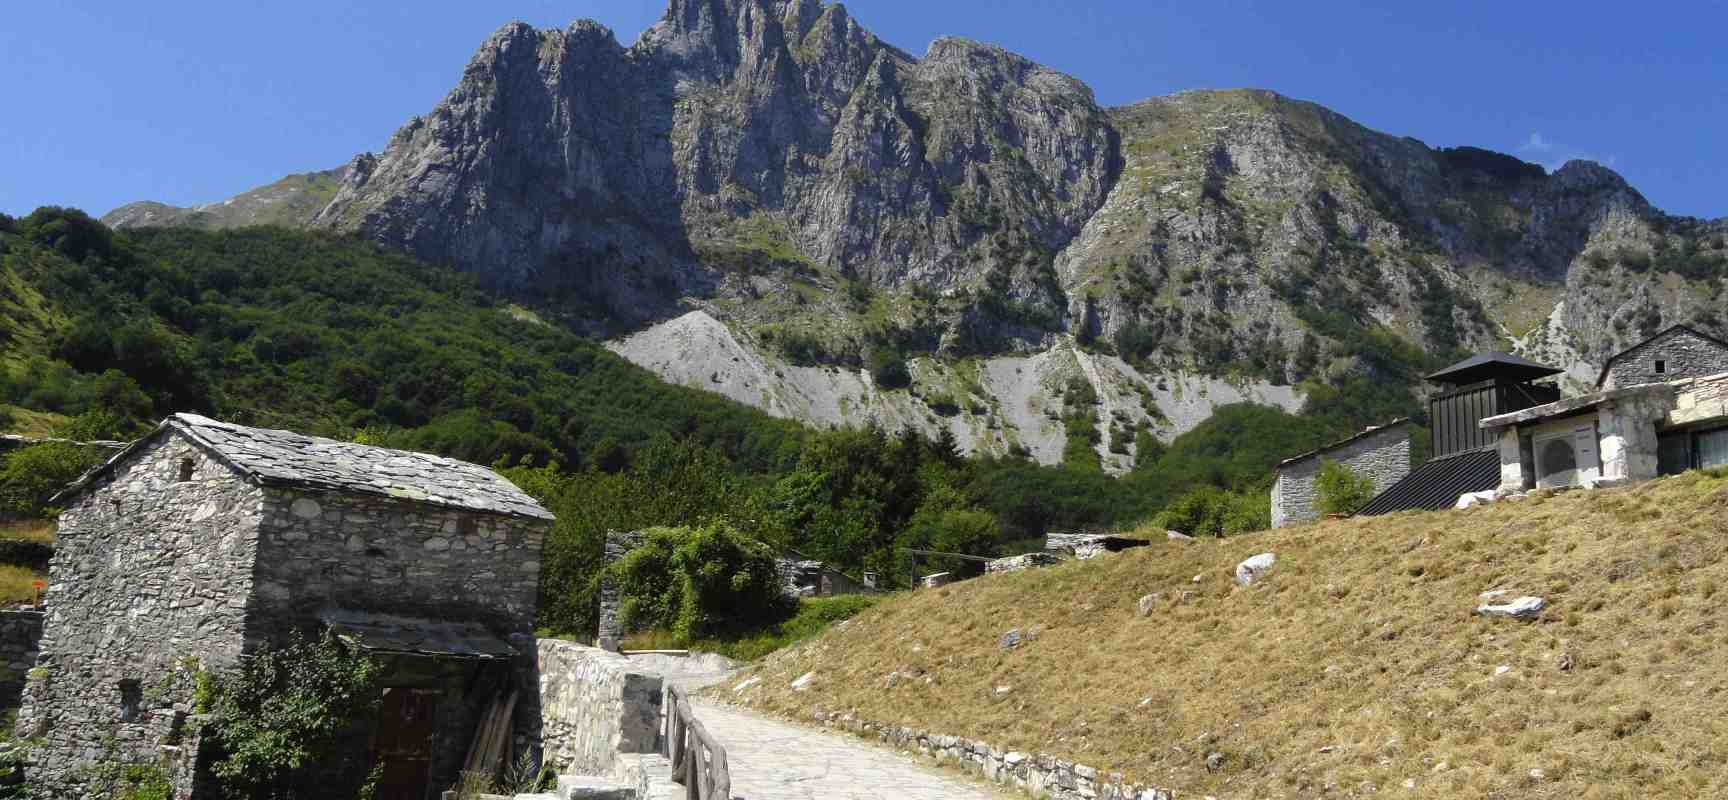 Wild trek! 3 Selvaggi giorni in Apuane, SI DORME  IN BIVACCO